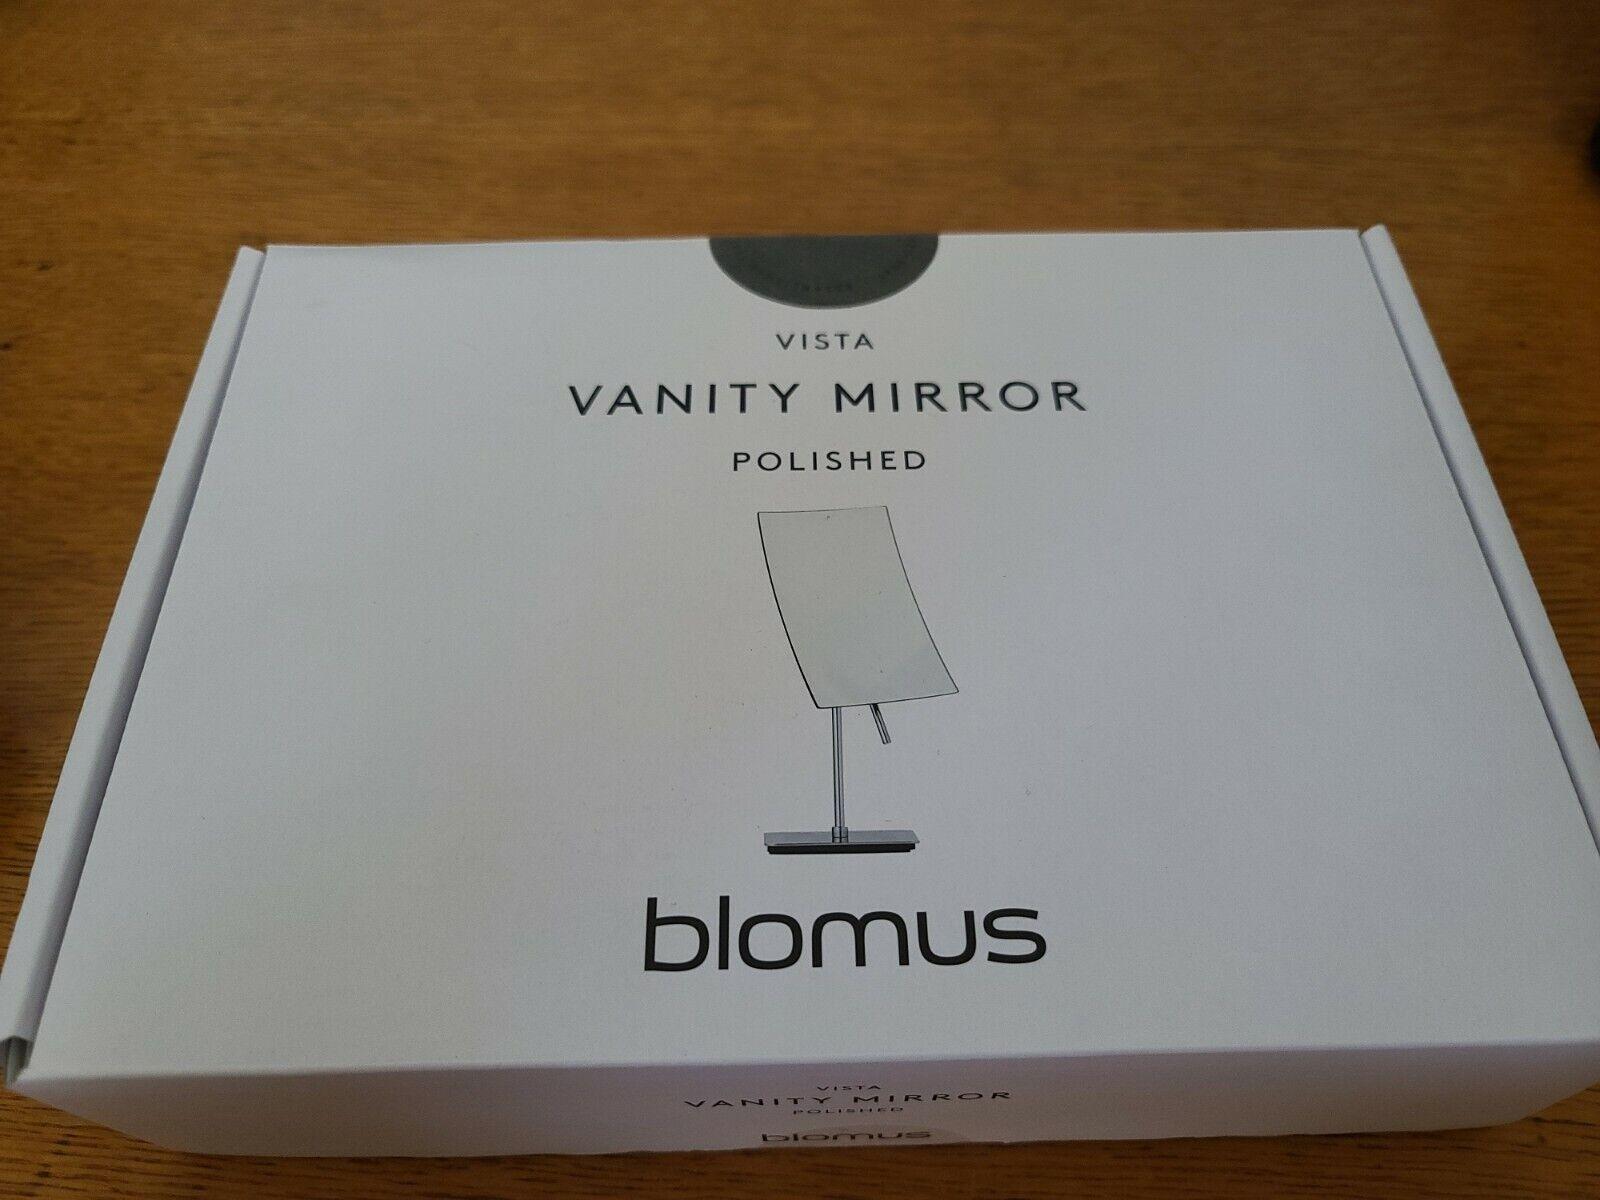 Blomus Vista Cosmetic Mirror 5X Magnification, Nickel, Bath Makeup Vanity Stand